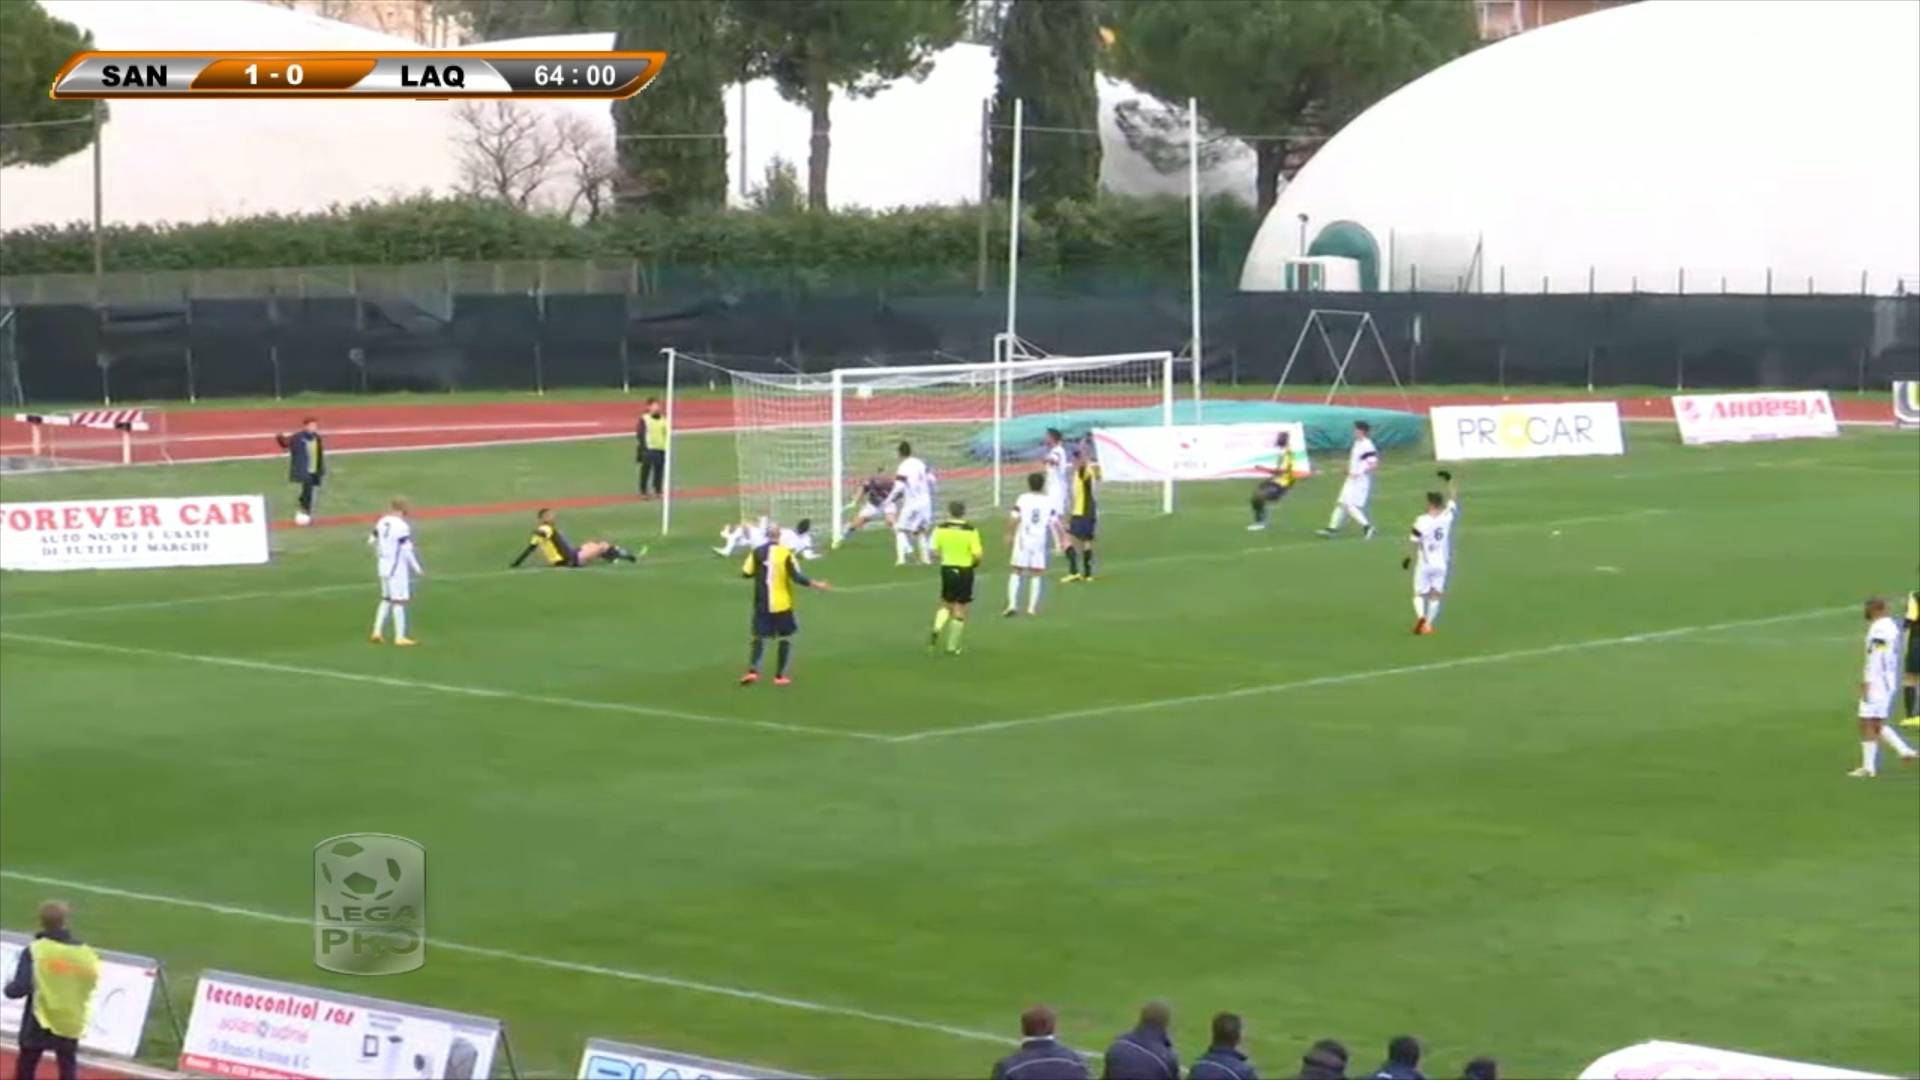 Santarcangelo-L'Aquila 2-0